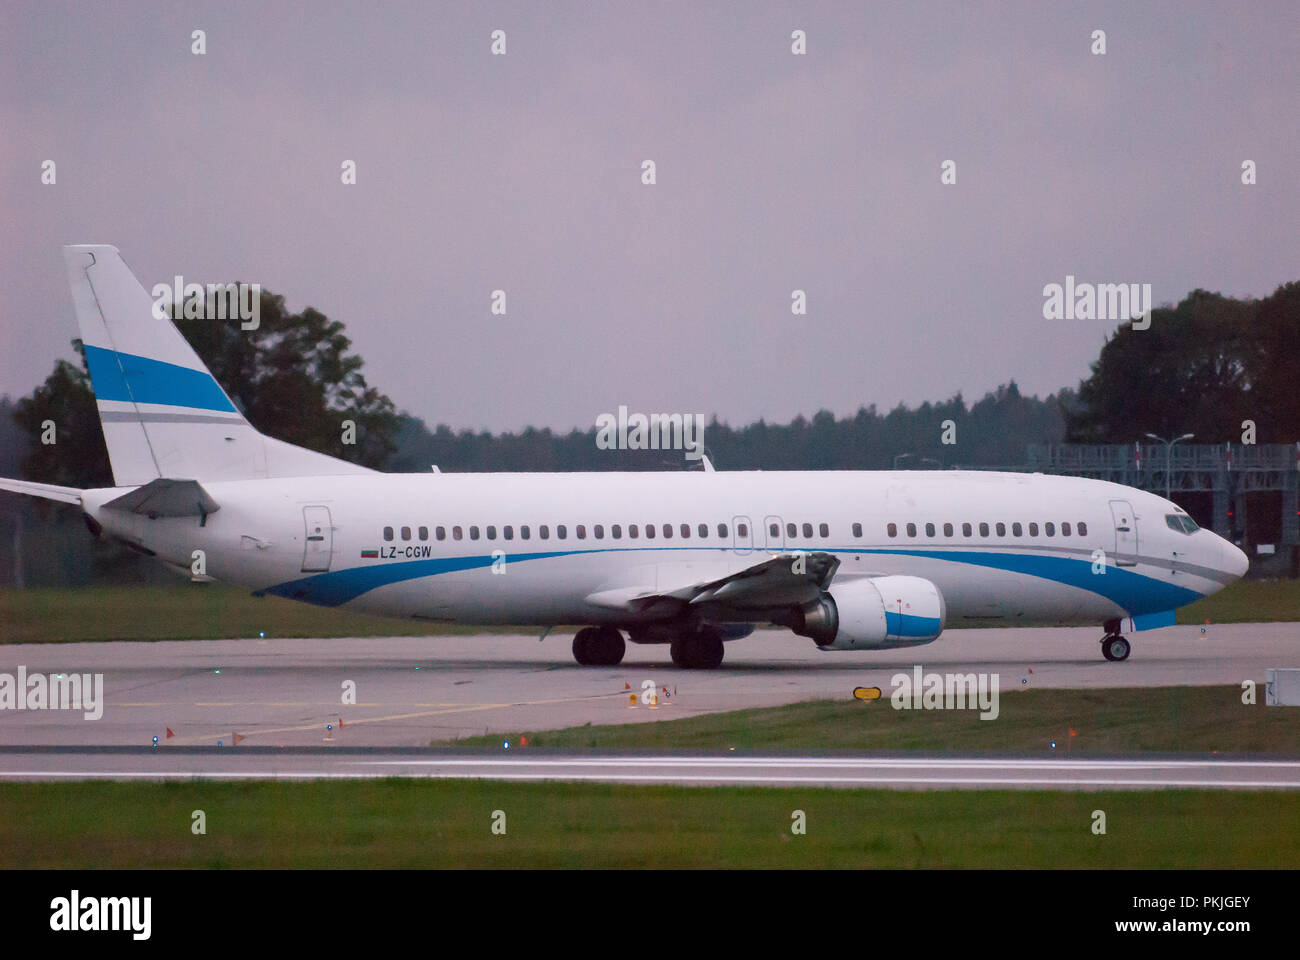 Bulgarian Cargo Air Boeing 737-400 in Gdansk Lech Walesa Airport in Gdansk, Poland. September 12th 2018 © Wojciech Strozyk / Alamy Stock Photo Stock Photo